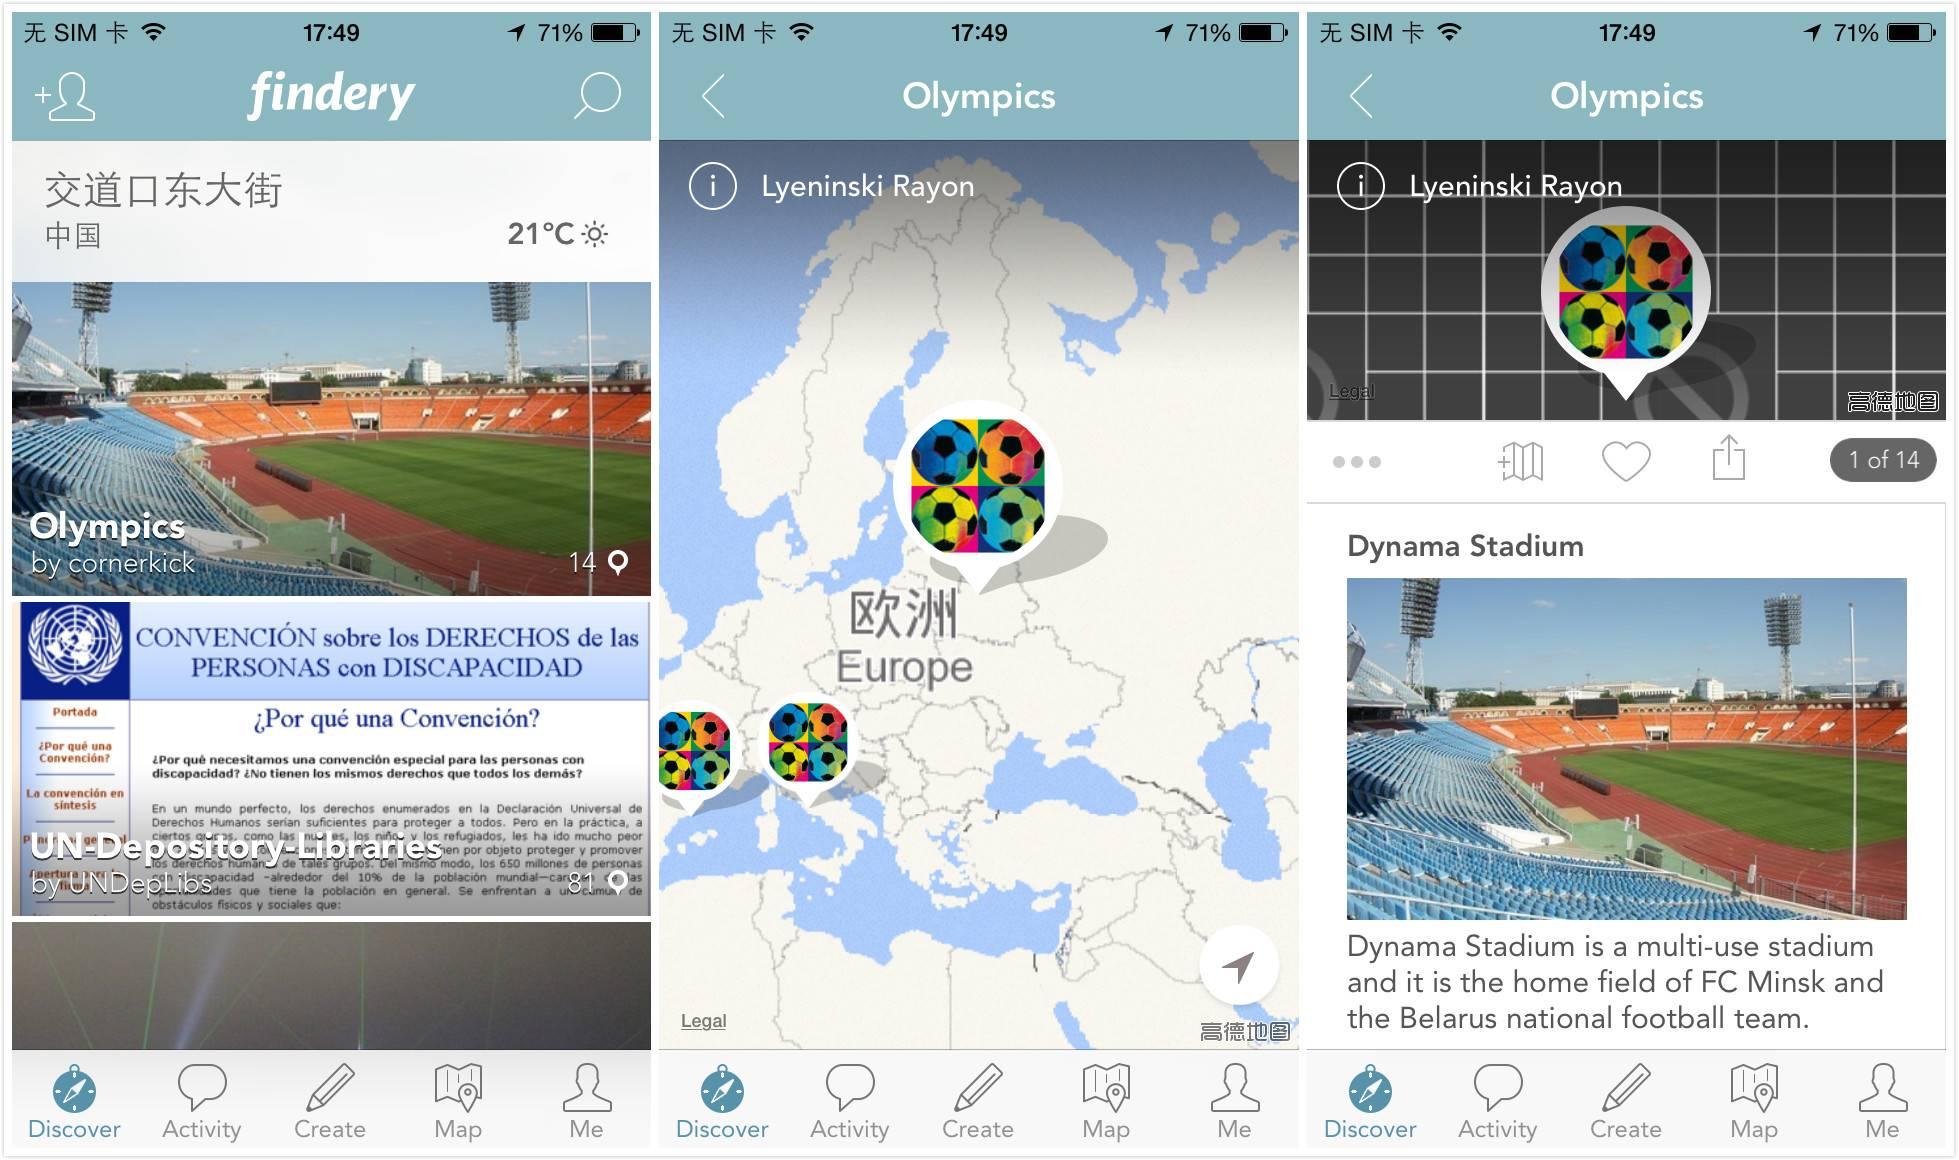 findery-app-1